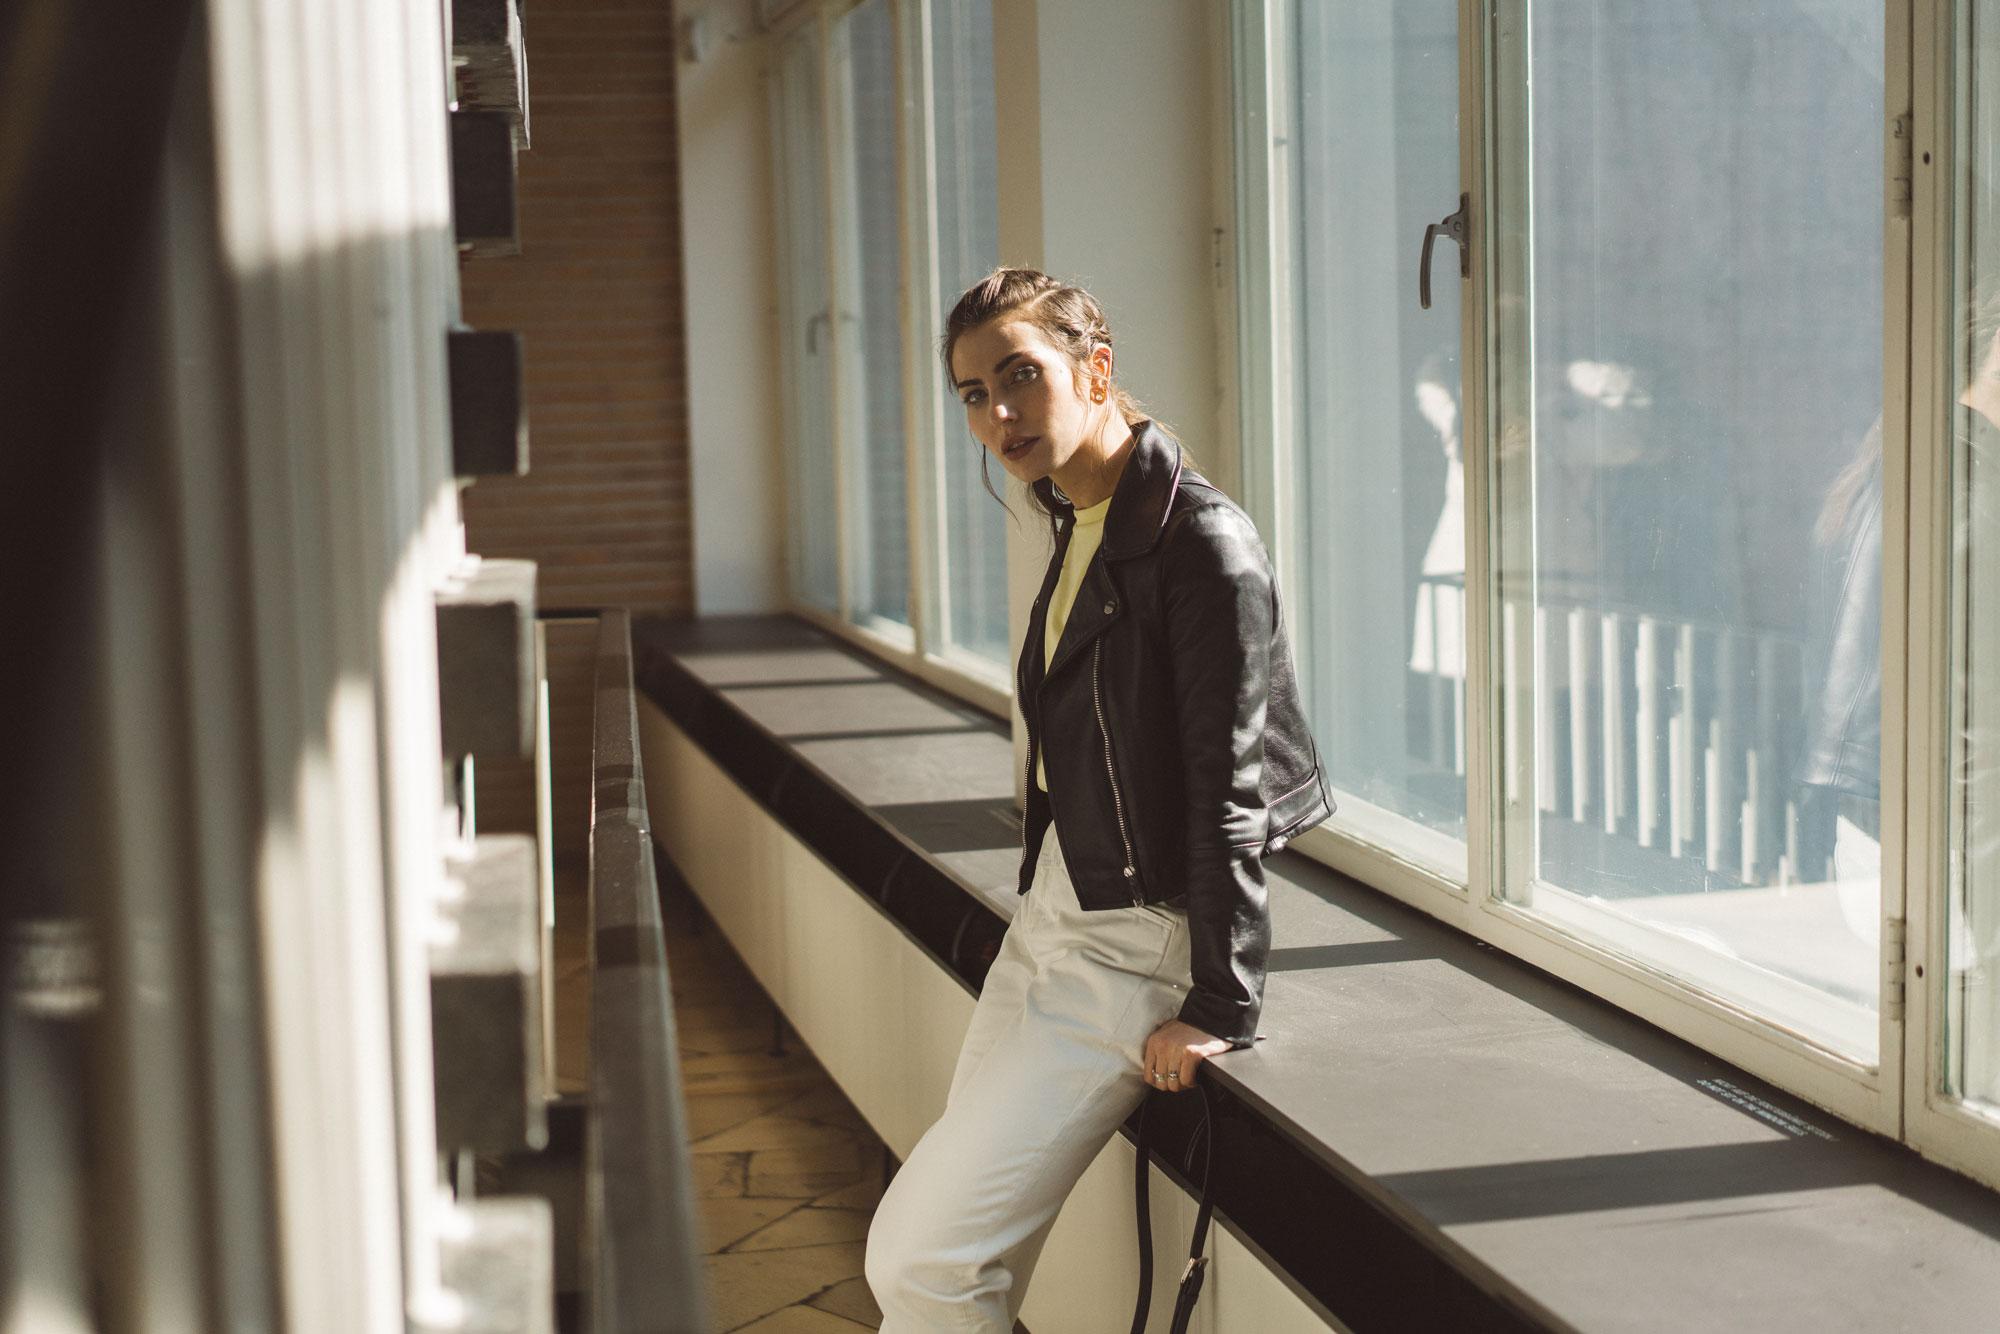 CO Berlin Amerika Haus | Charlottenburg | Indoor Shooting | Editorial | Outfit: Closed | Masha Sedgwick with Boyfriend David Jacob